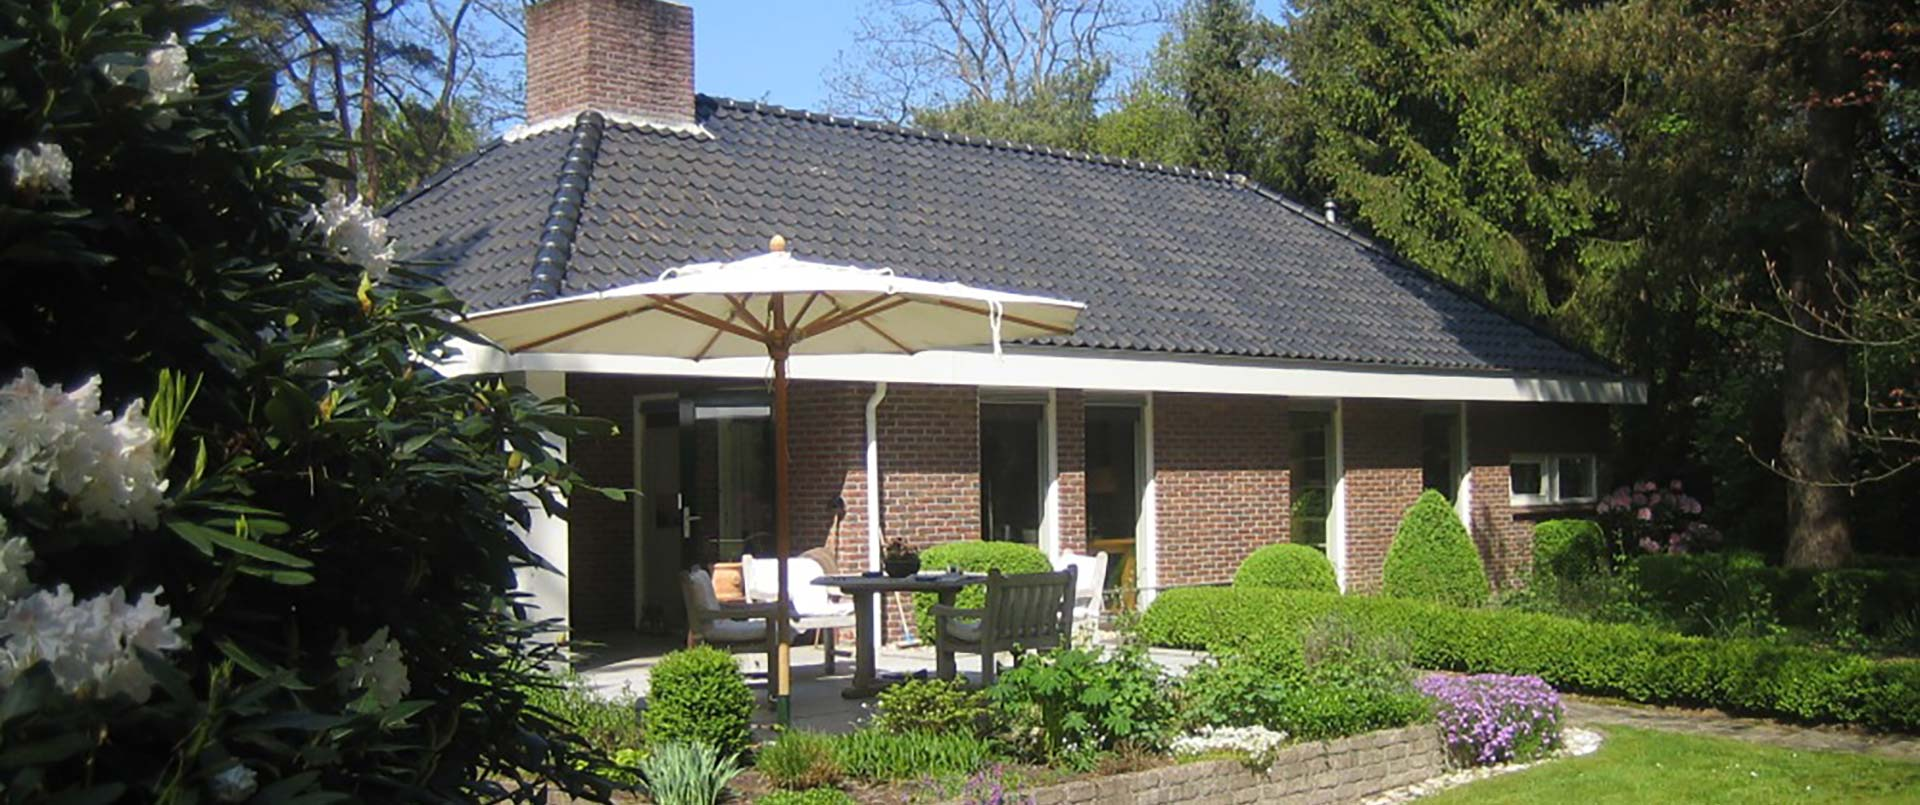 overnachten in Drenthe, bed and breakfast zuidlaren, BB Schipborg